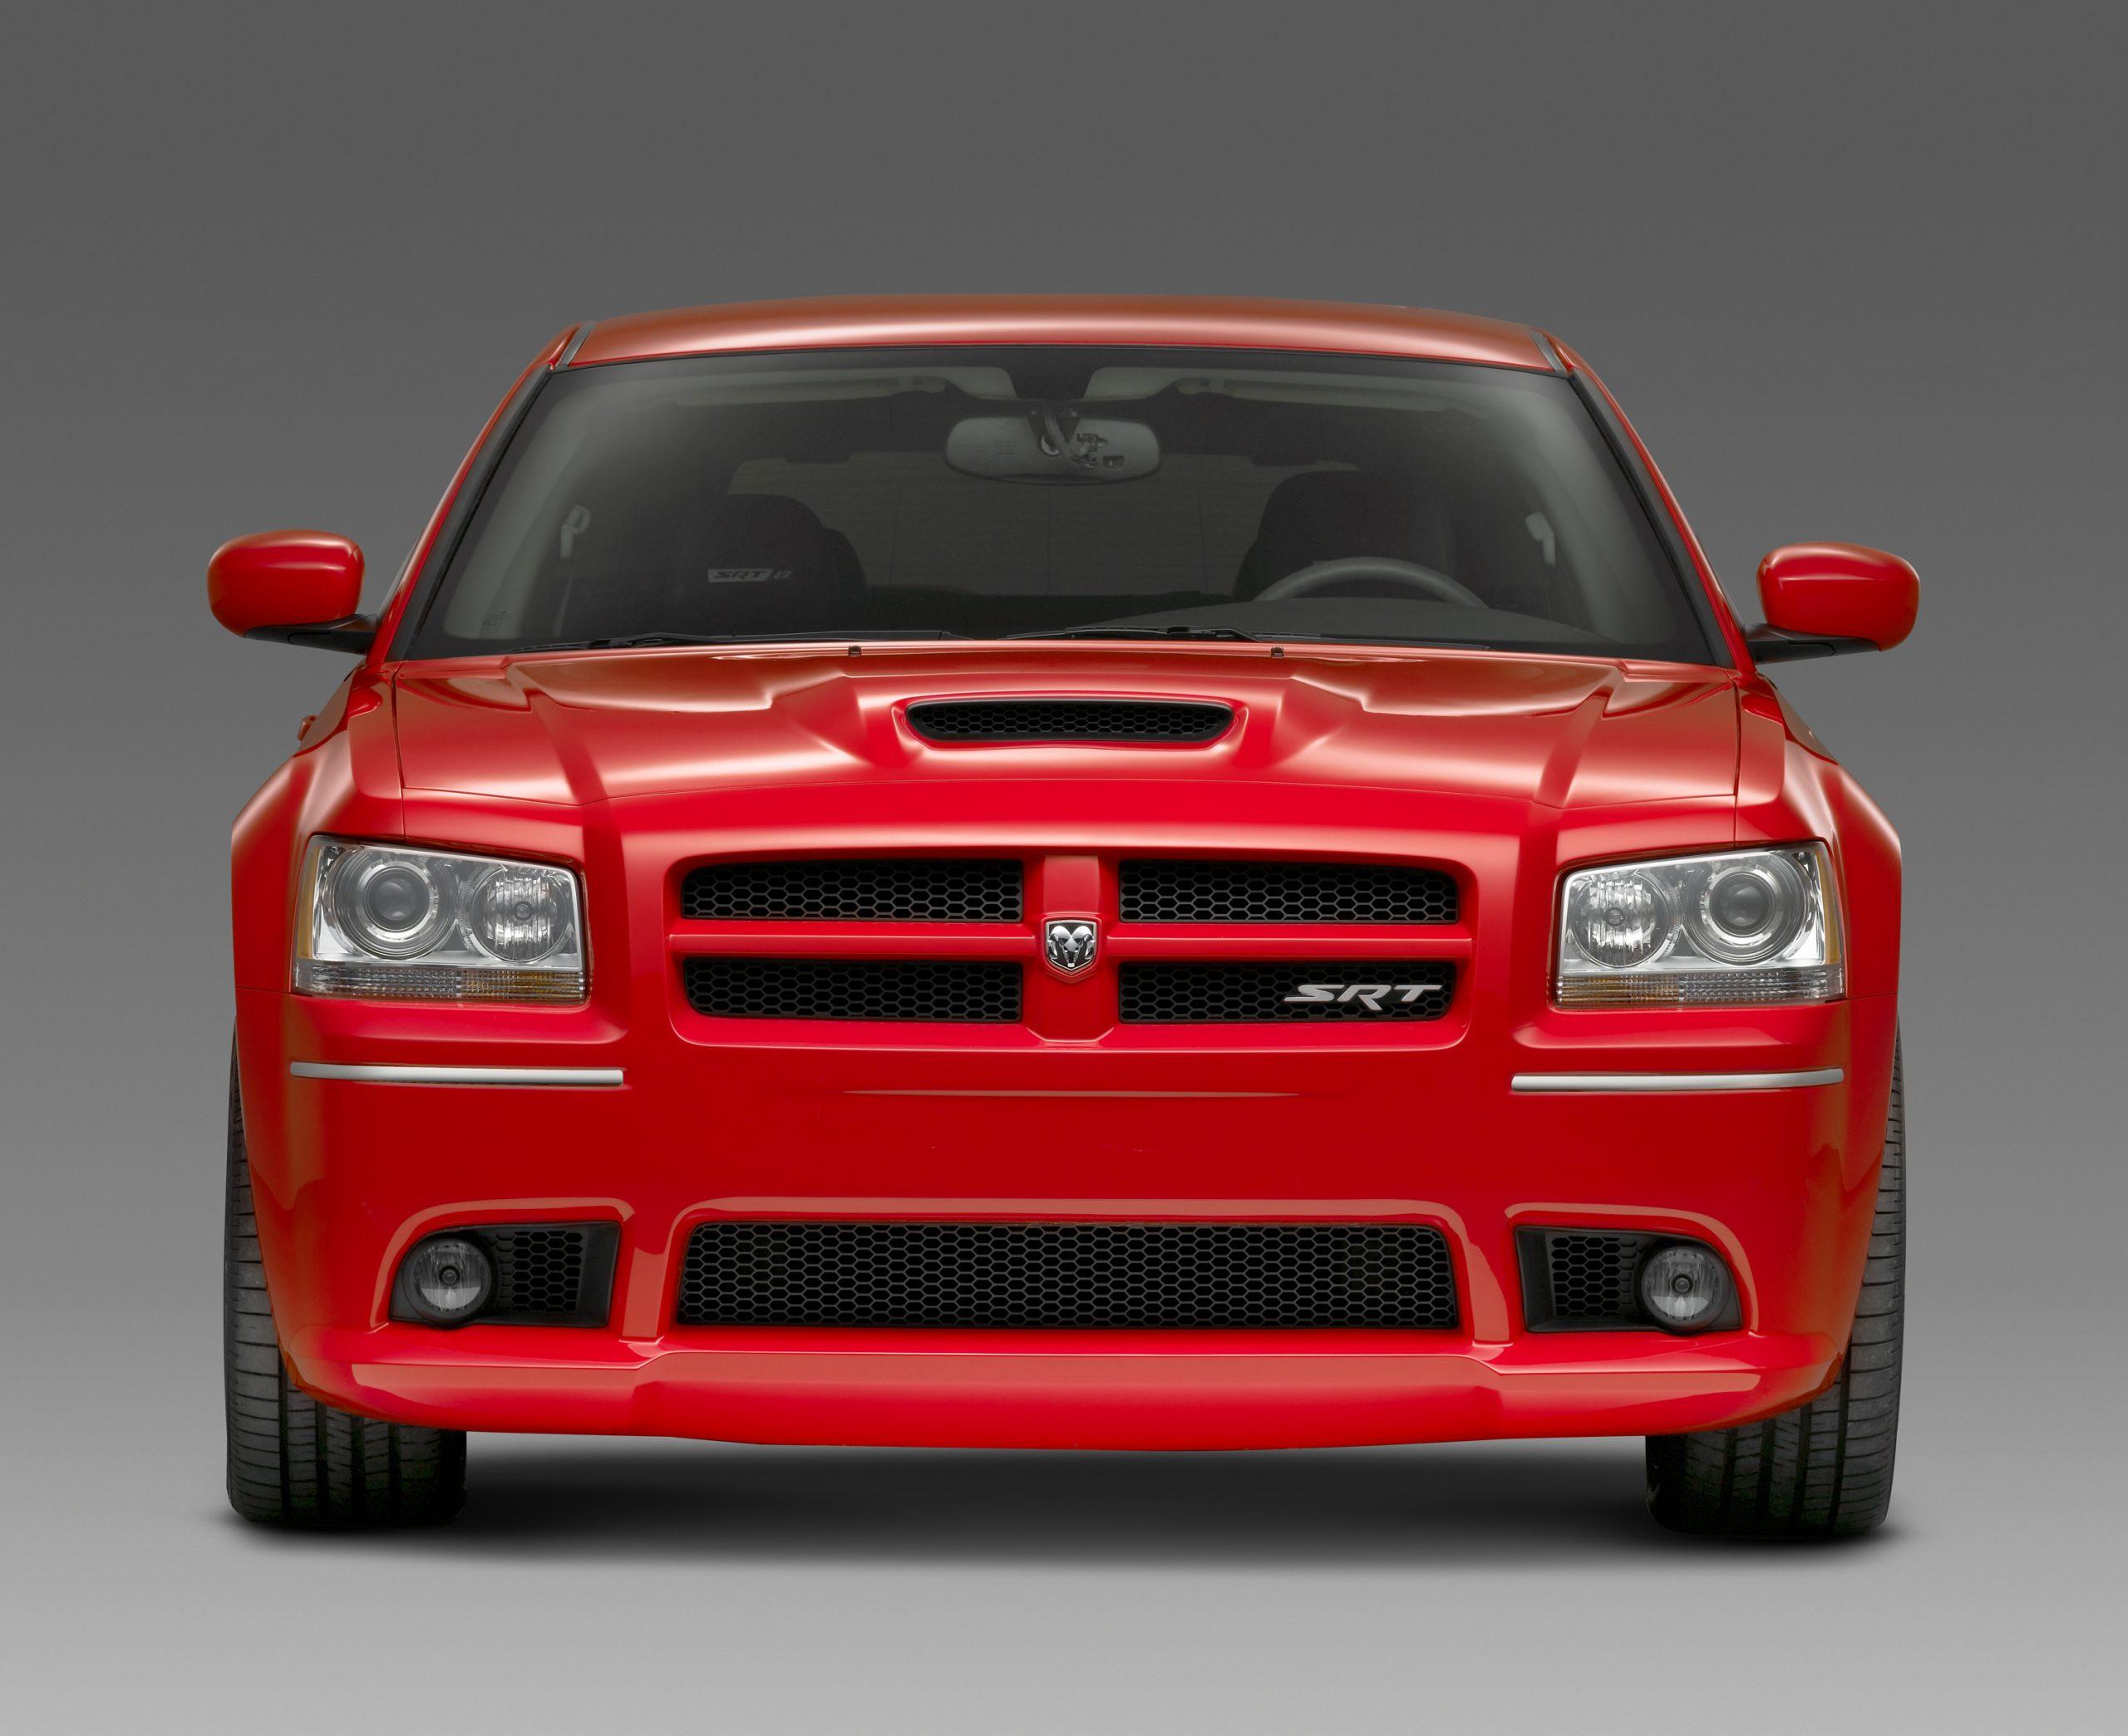 2008 Dodge Magnum SRT8 hemi wagon front fascia